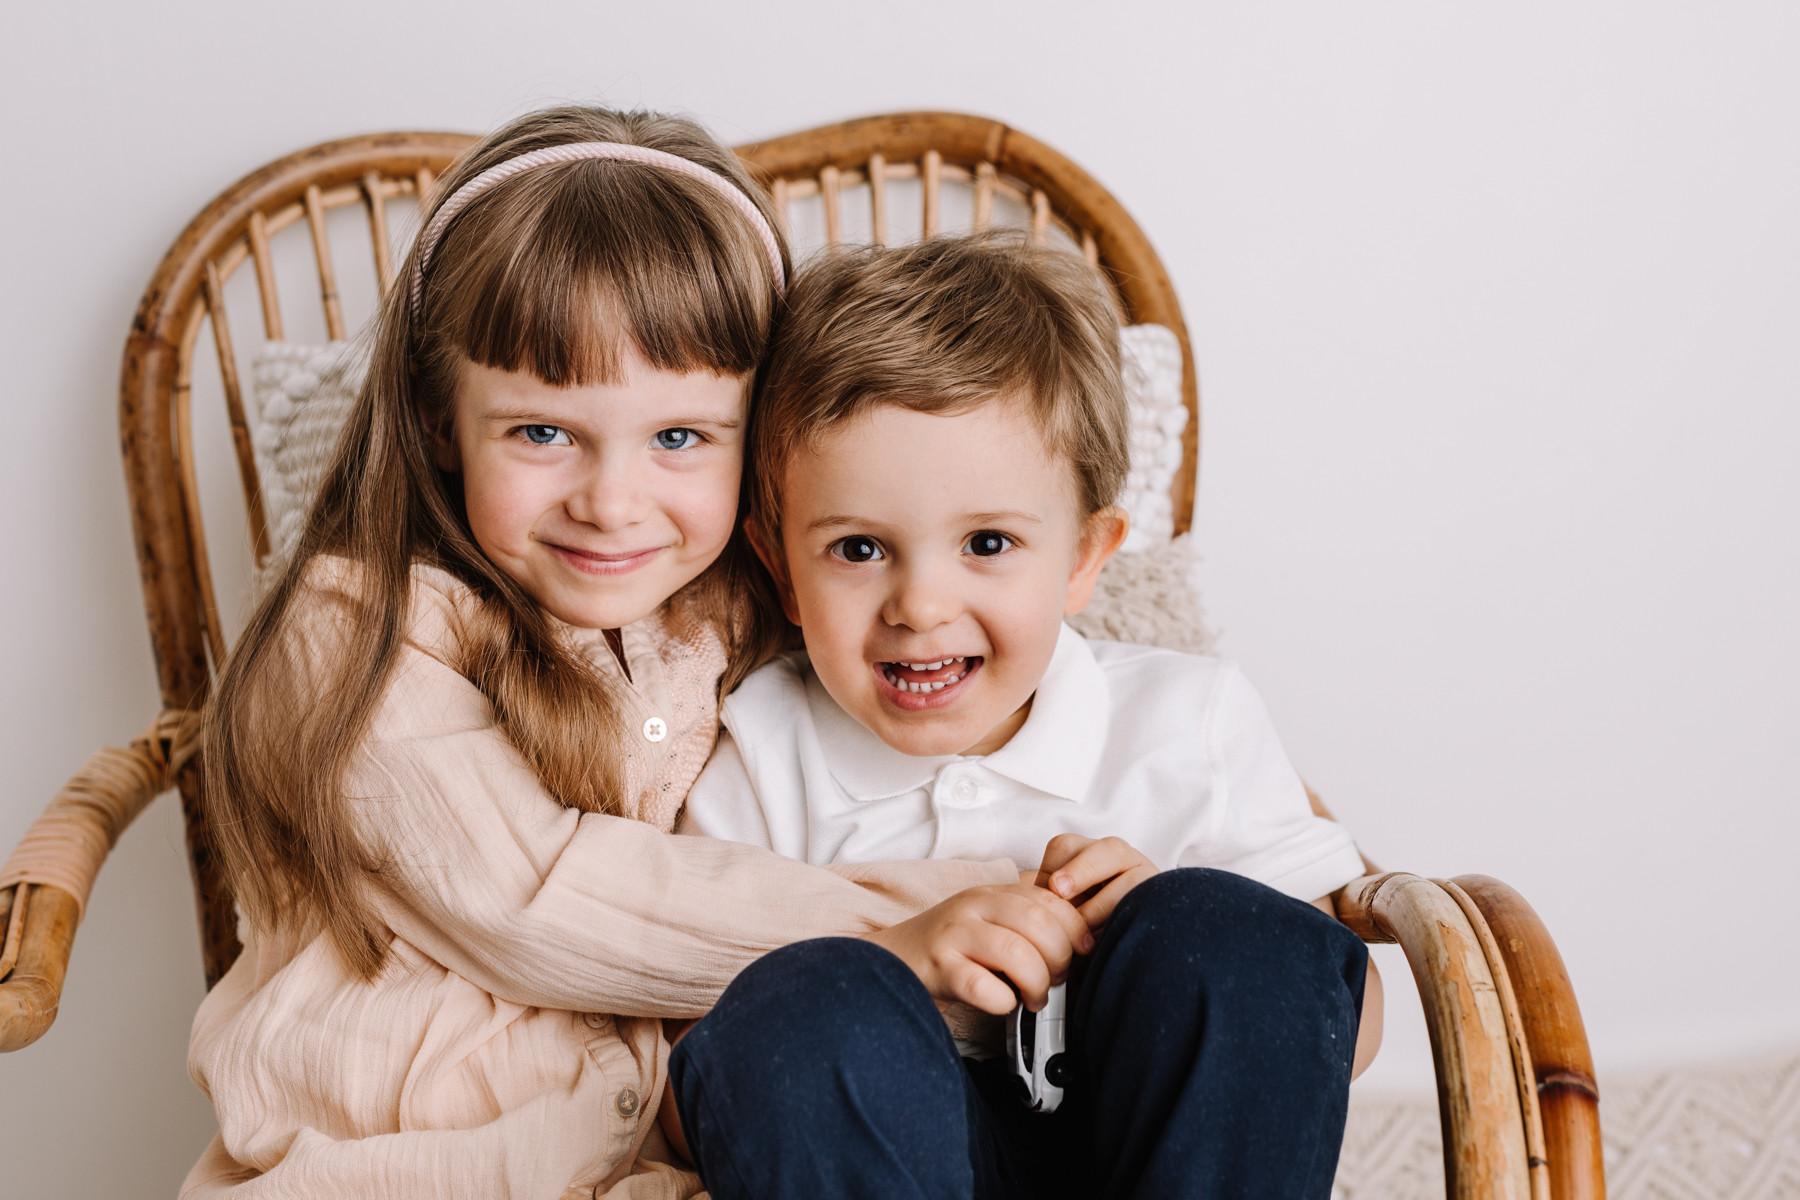 Perhekuvaus lapsikuvaus sisaruskuvaus lahti